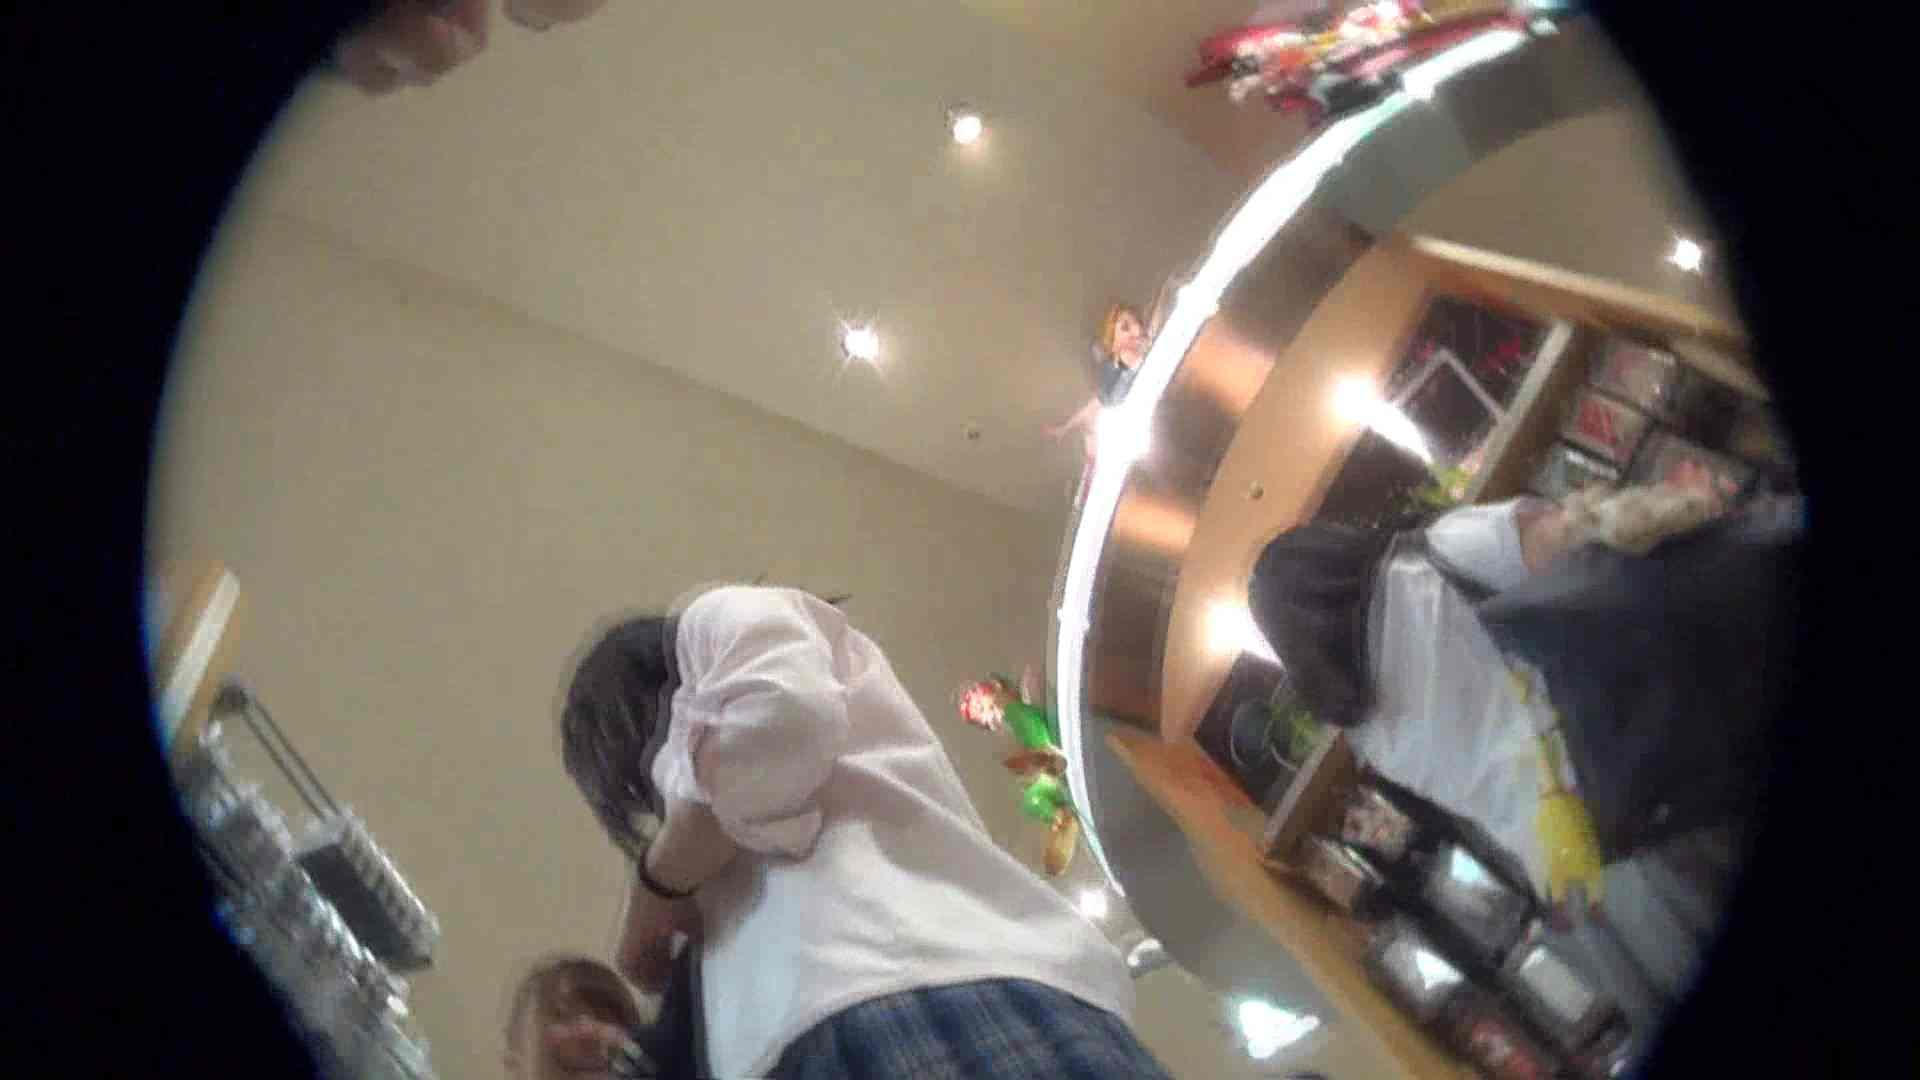 (FHD)ドリーム★アングルさんの逆さの極意 VOL.02 OLセックス 盗撮オメコ無修正動画無料 107画像 67